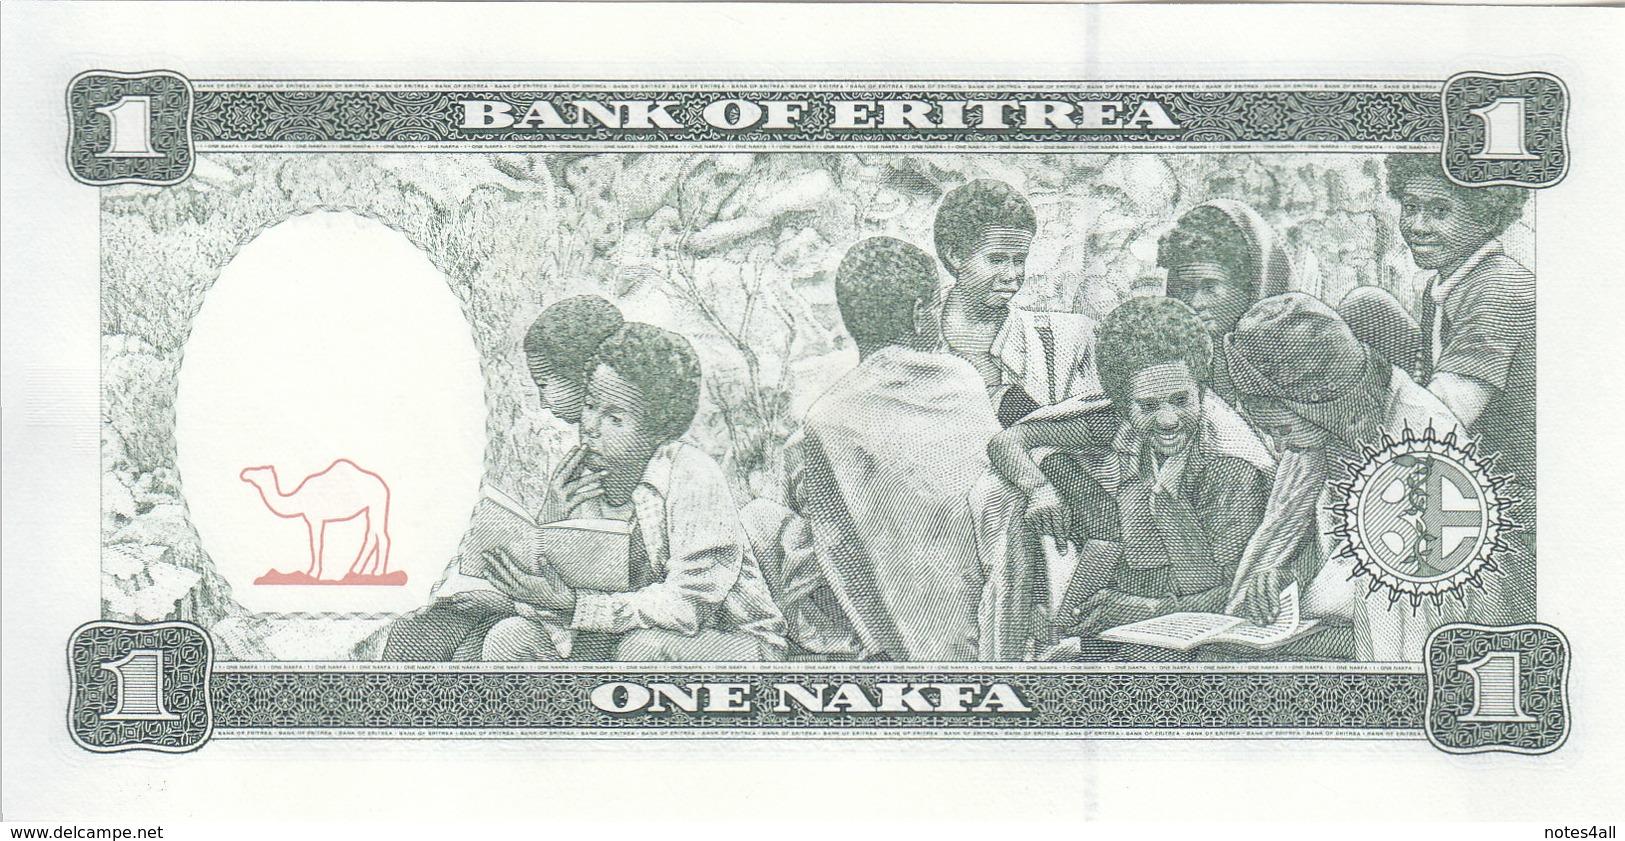 ERITREA 1 NAKFA 1997 P-1 UNC LOT X5 NOTES CONSECUTIVE - Erythrée